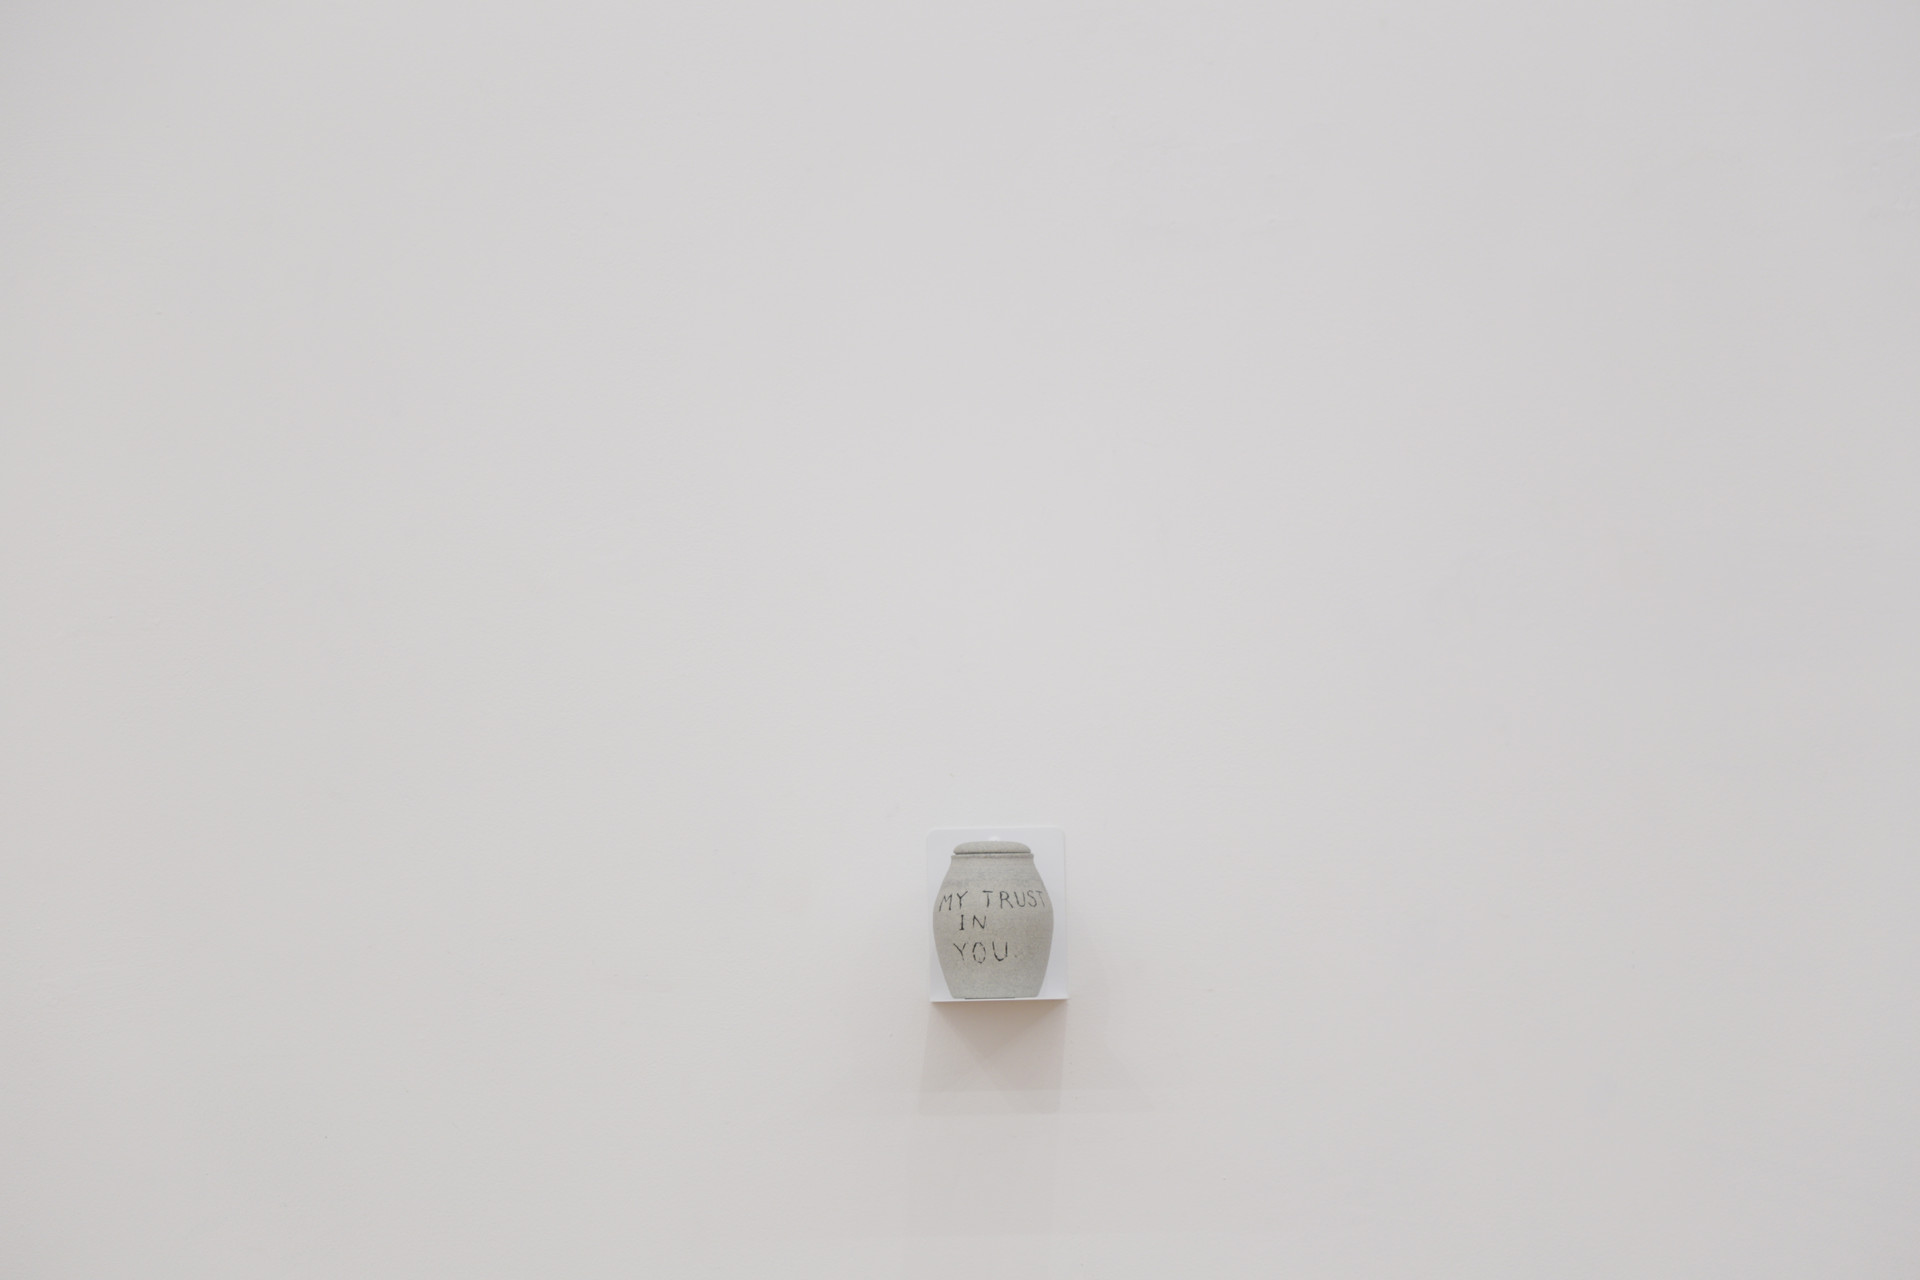 inst angee urn2.JPG